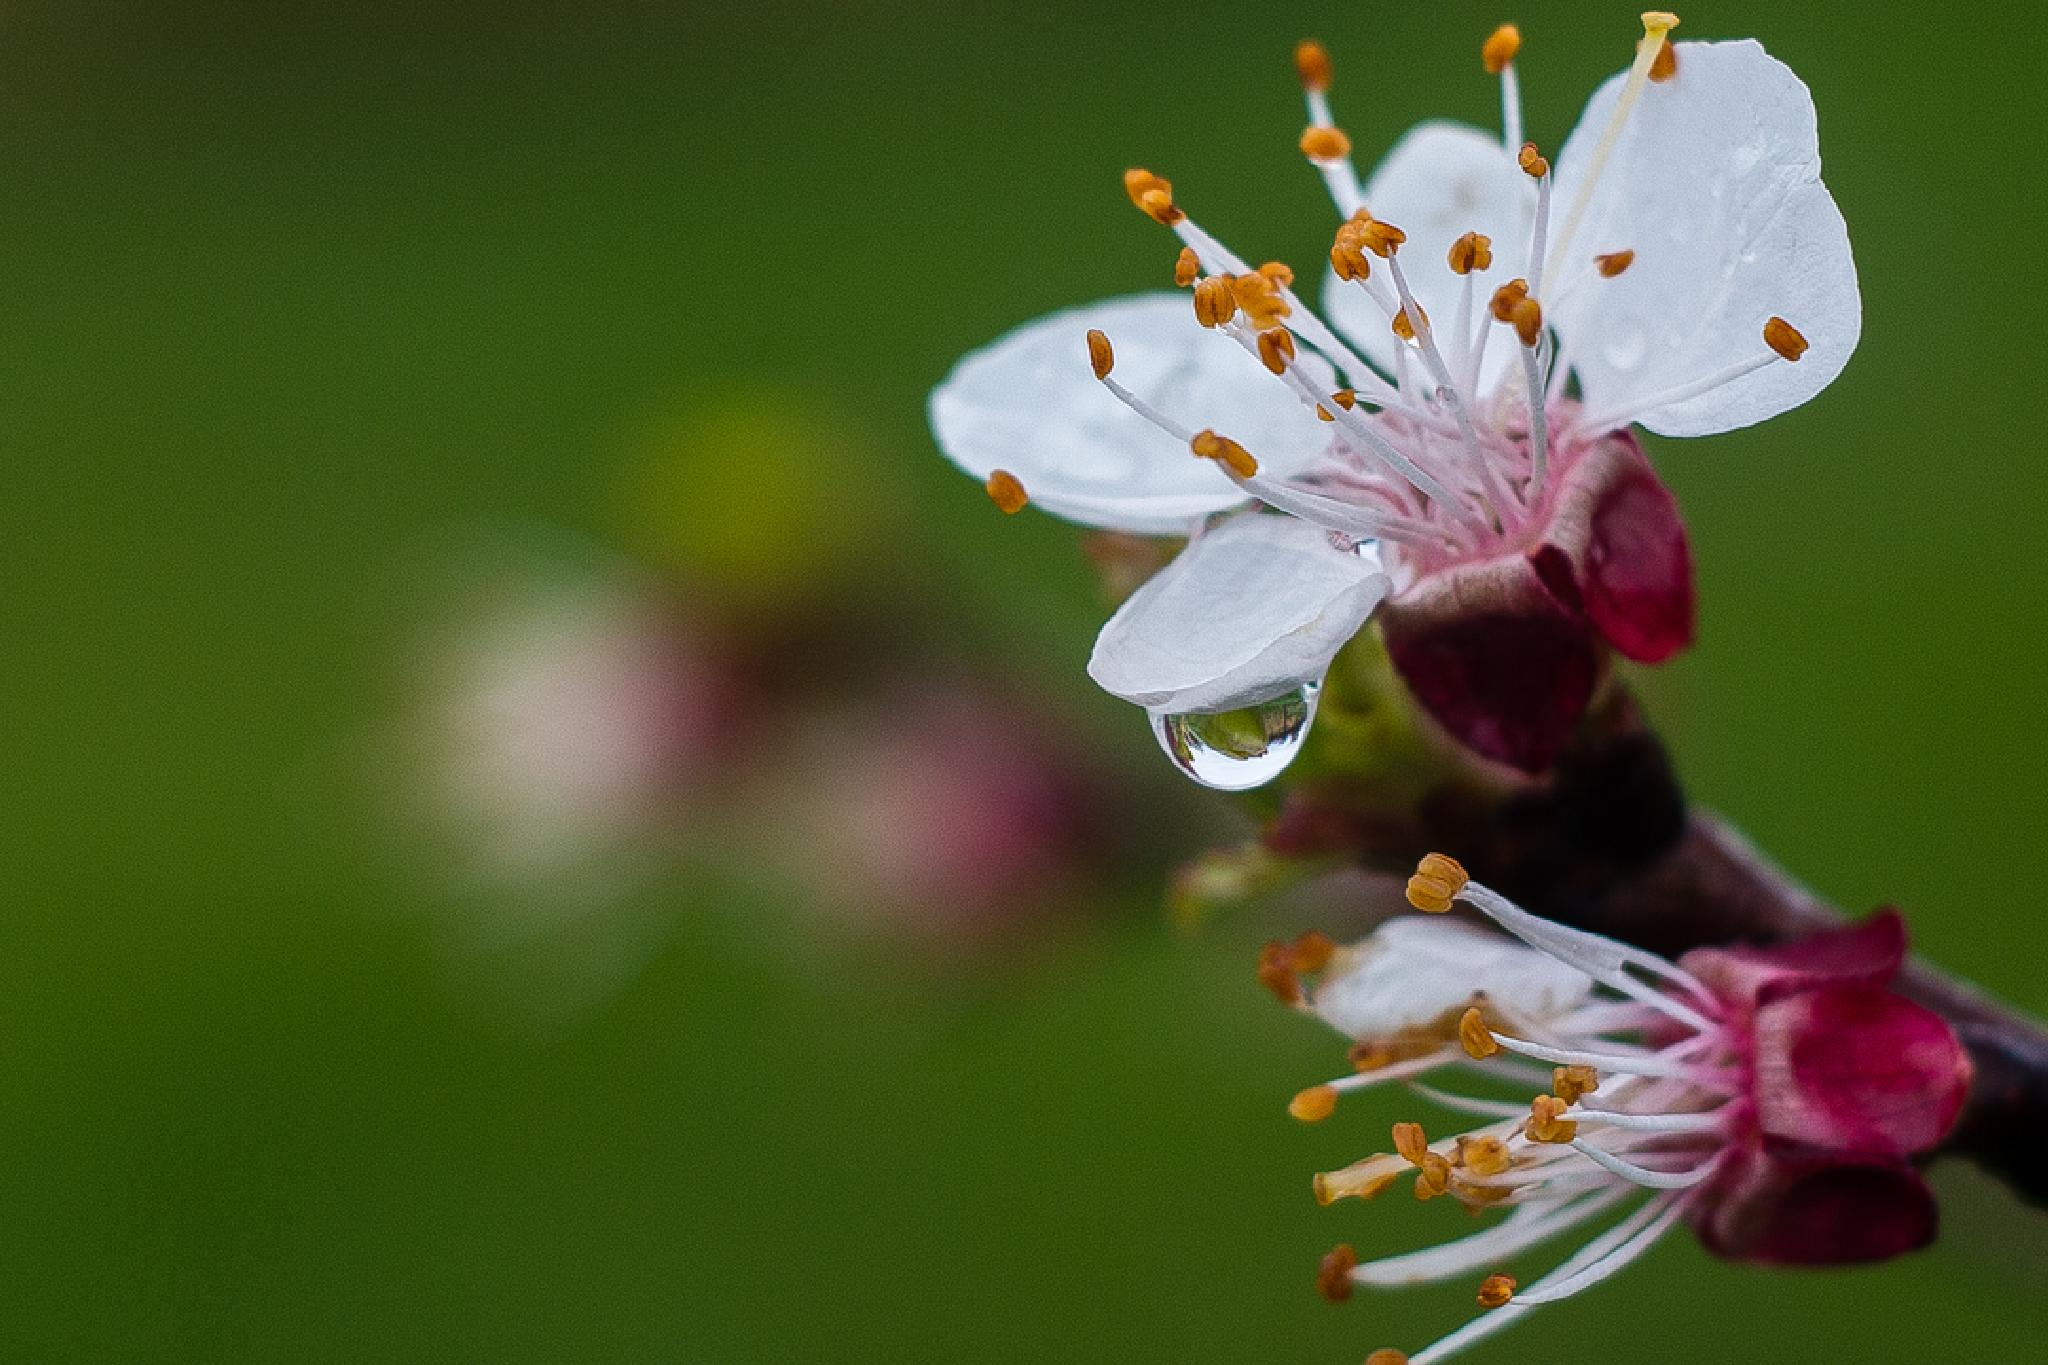 Bloom by Goran Matejin